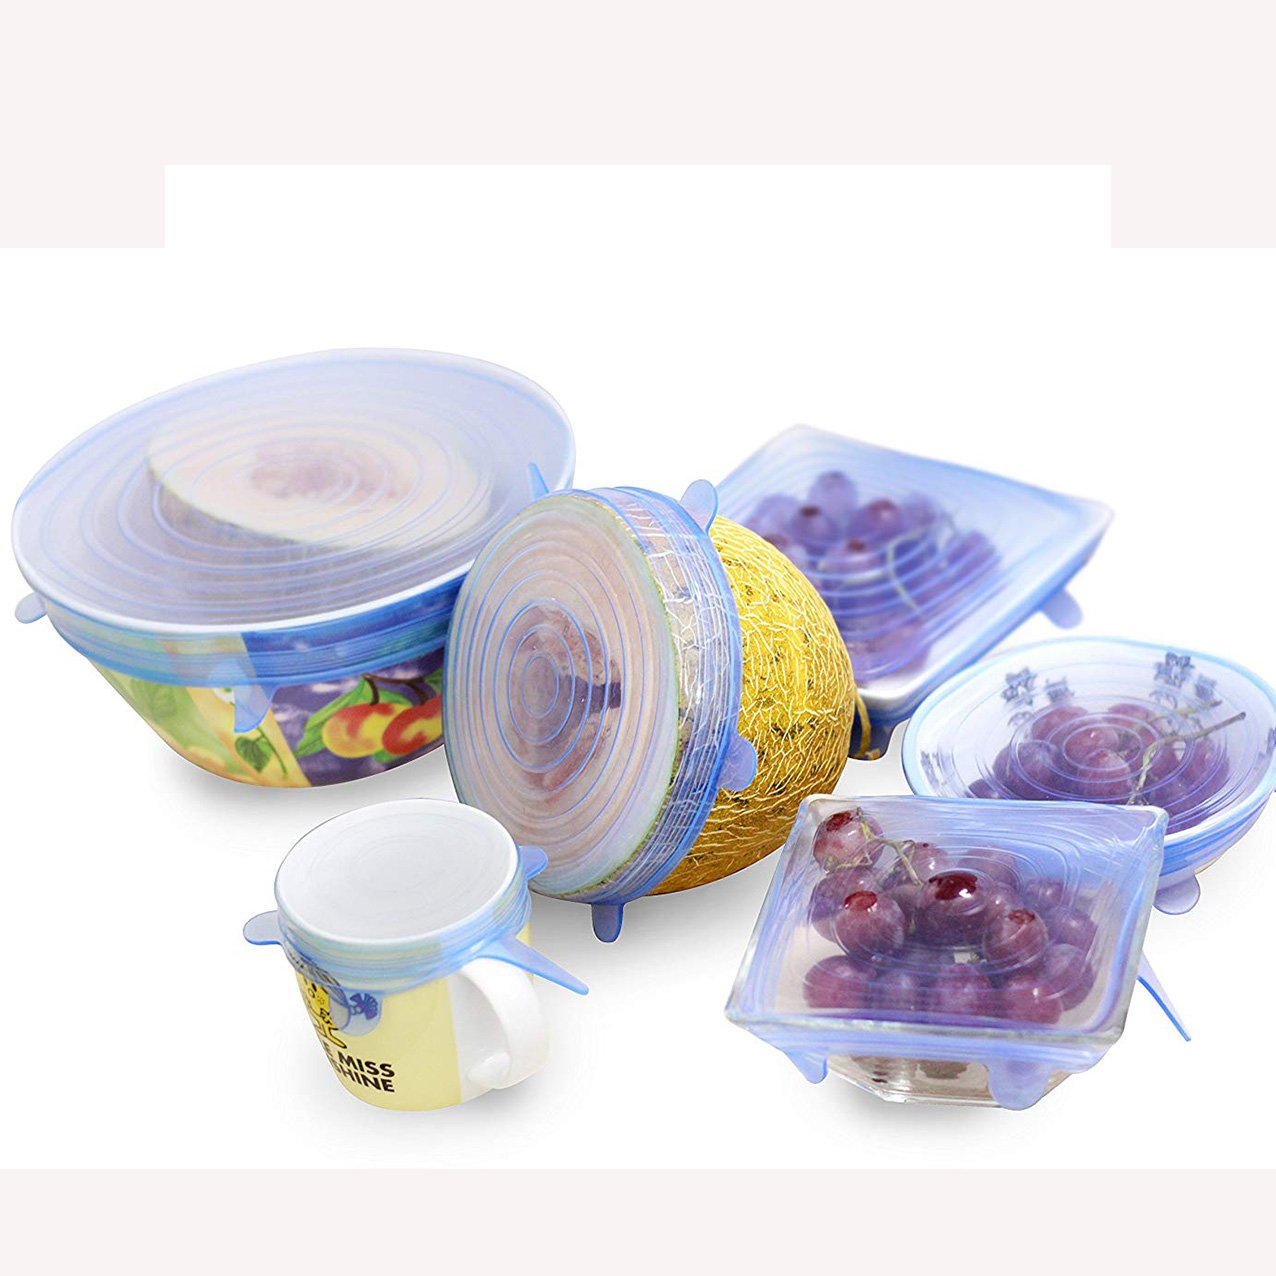 OUBORUI 6PCS/Set Silicone Food Lids Flexible Sealing Stretch Suit Pan Bowl Dish Covers